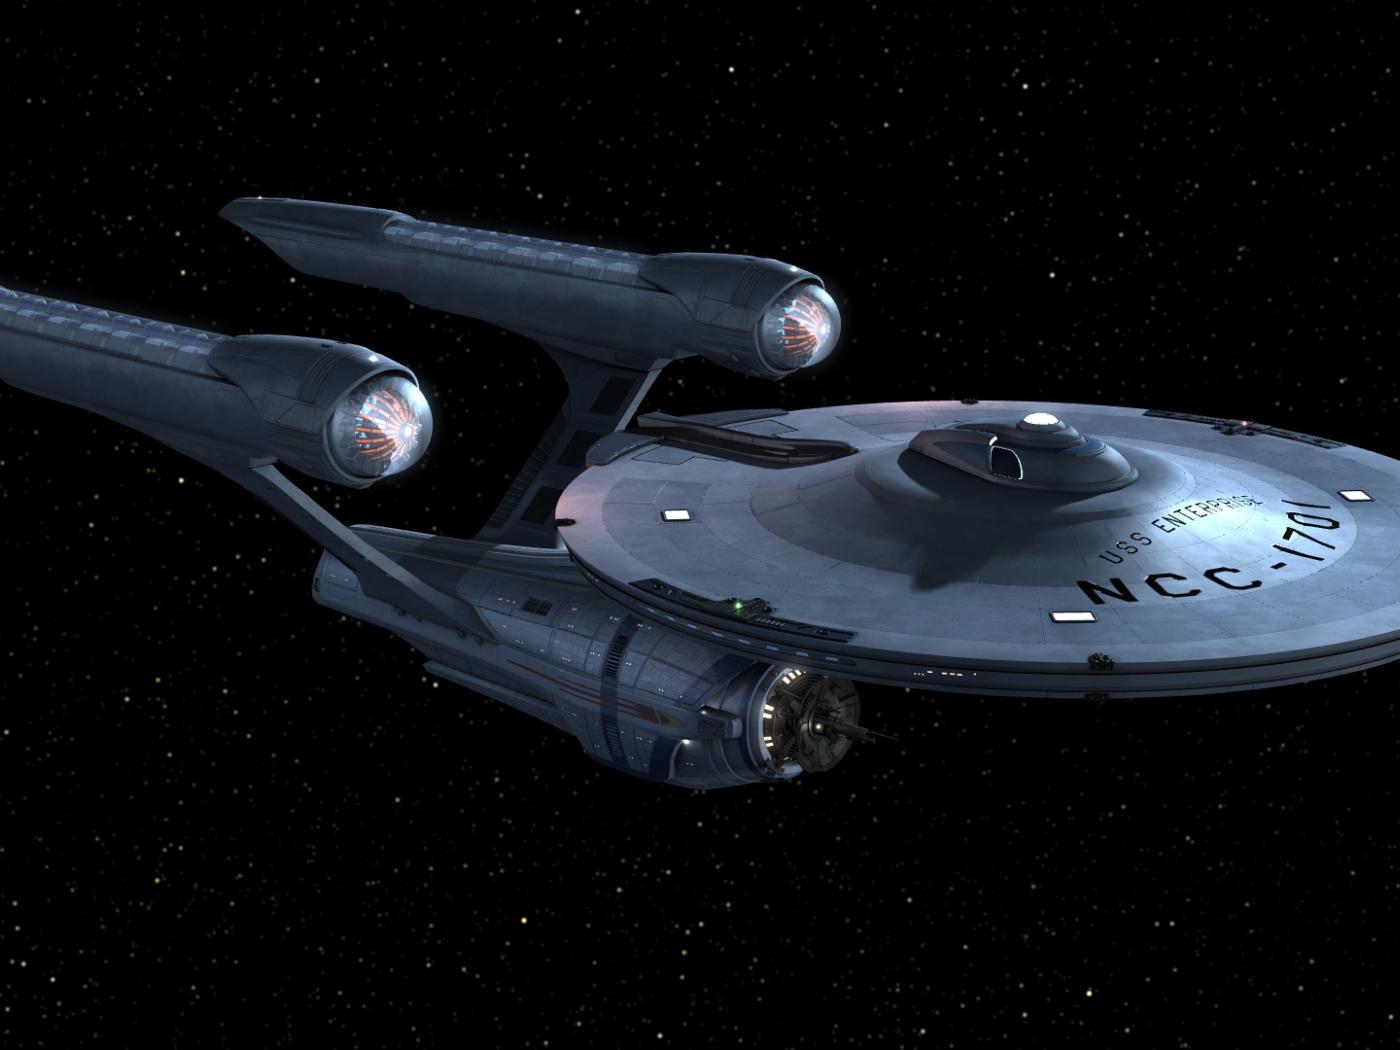 Space Ships Star Trek Online Wallpaper 1920x1200 Hq Wallpaper 1400x1050